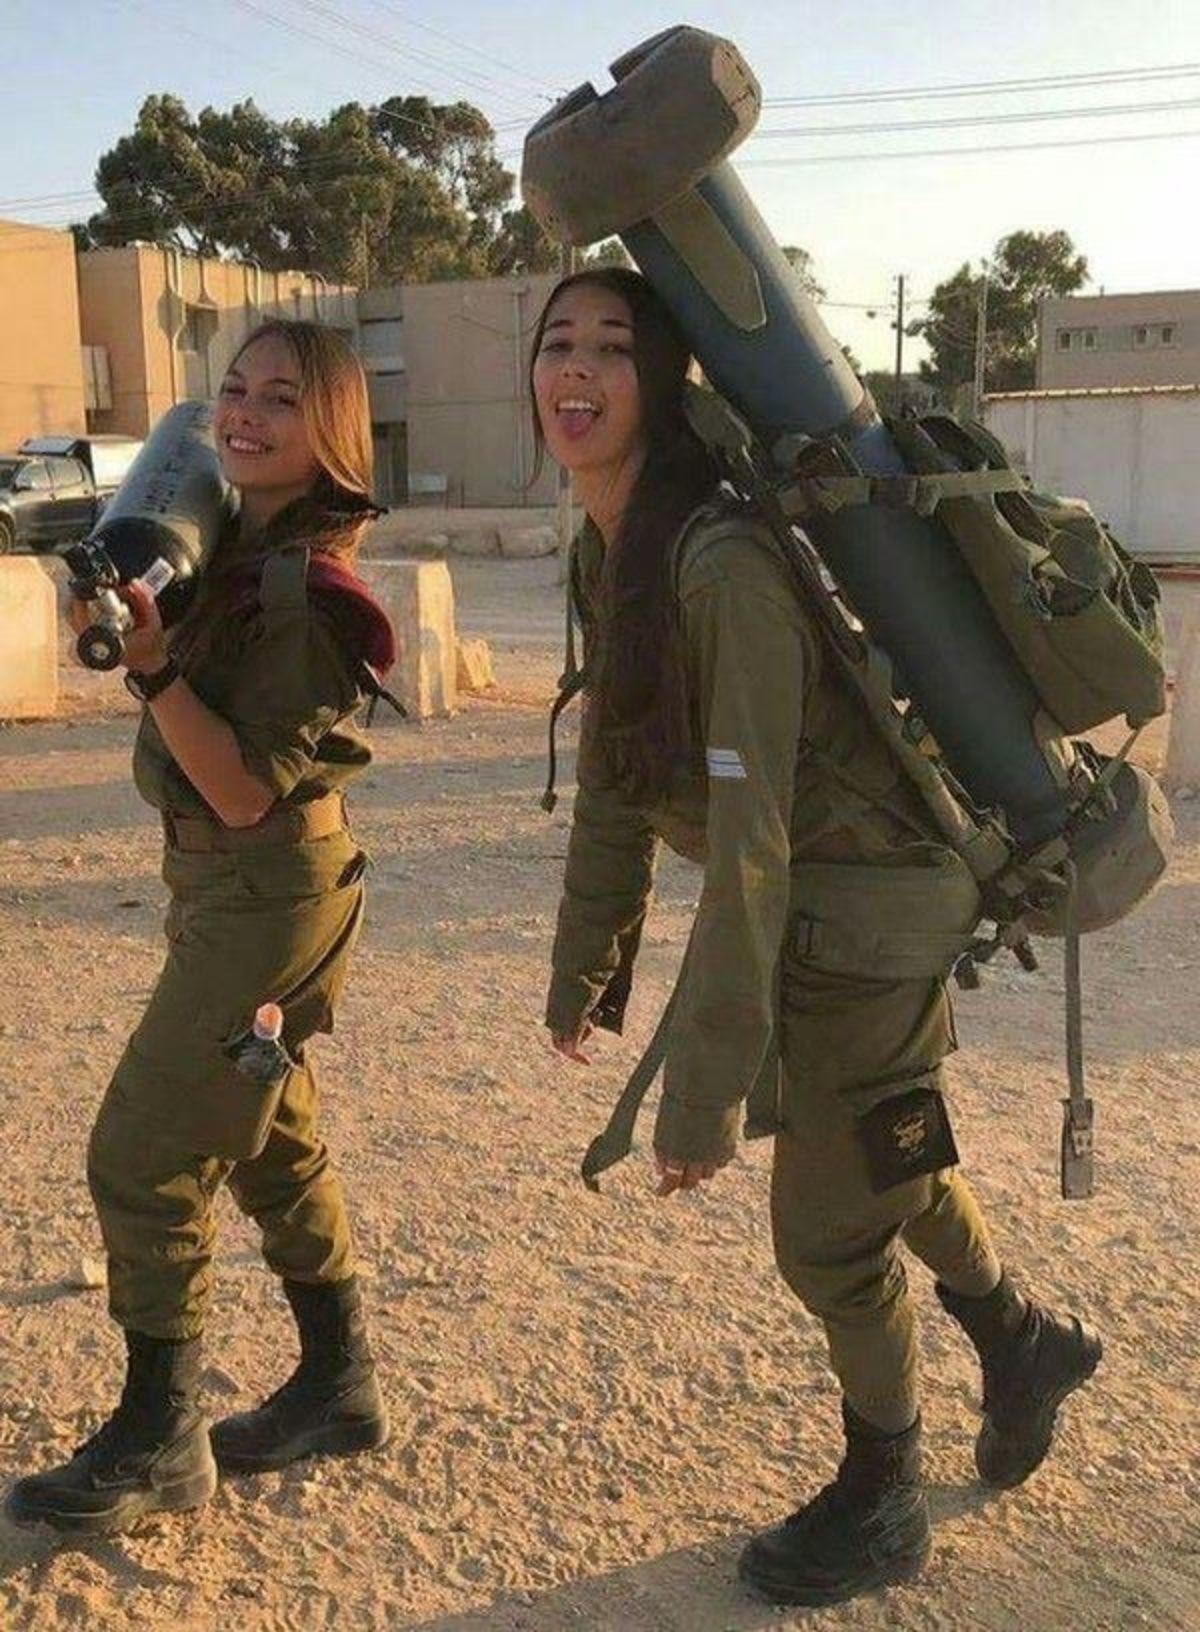 Us military girls